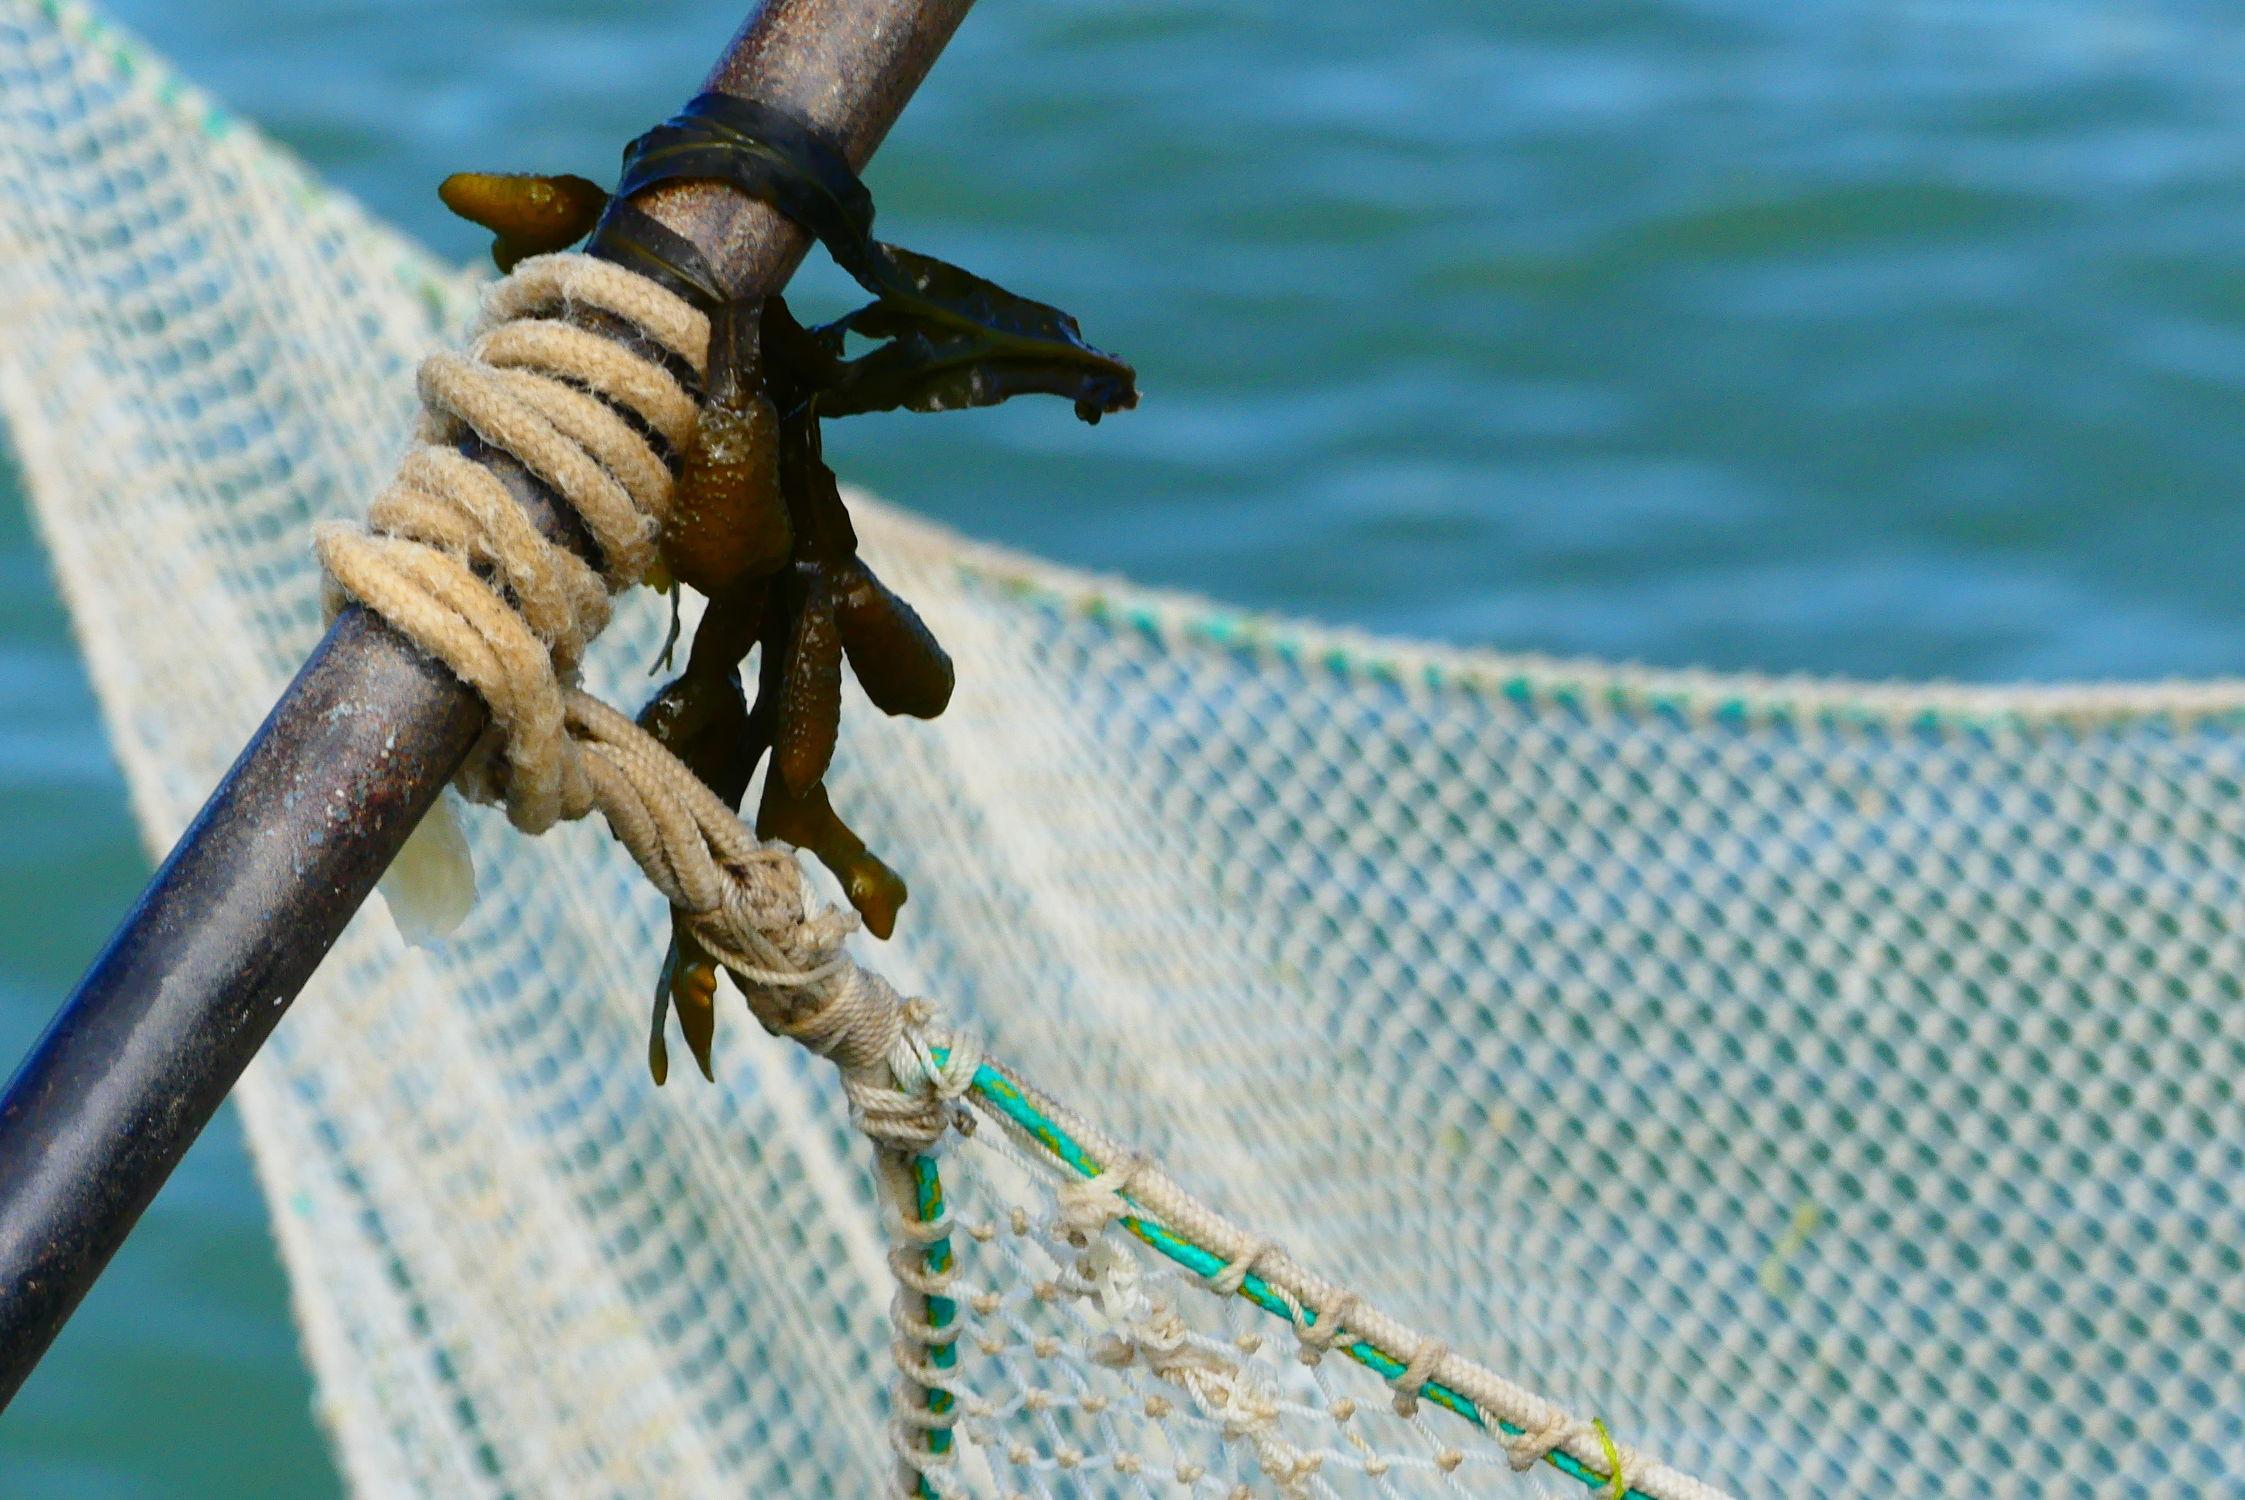 Bild mit Wasser, Meer, Algen, Netz, Fangnetze, angel